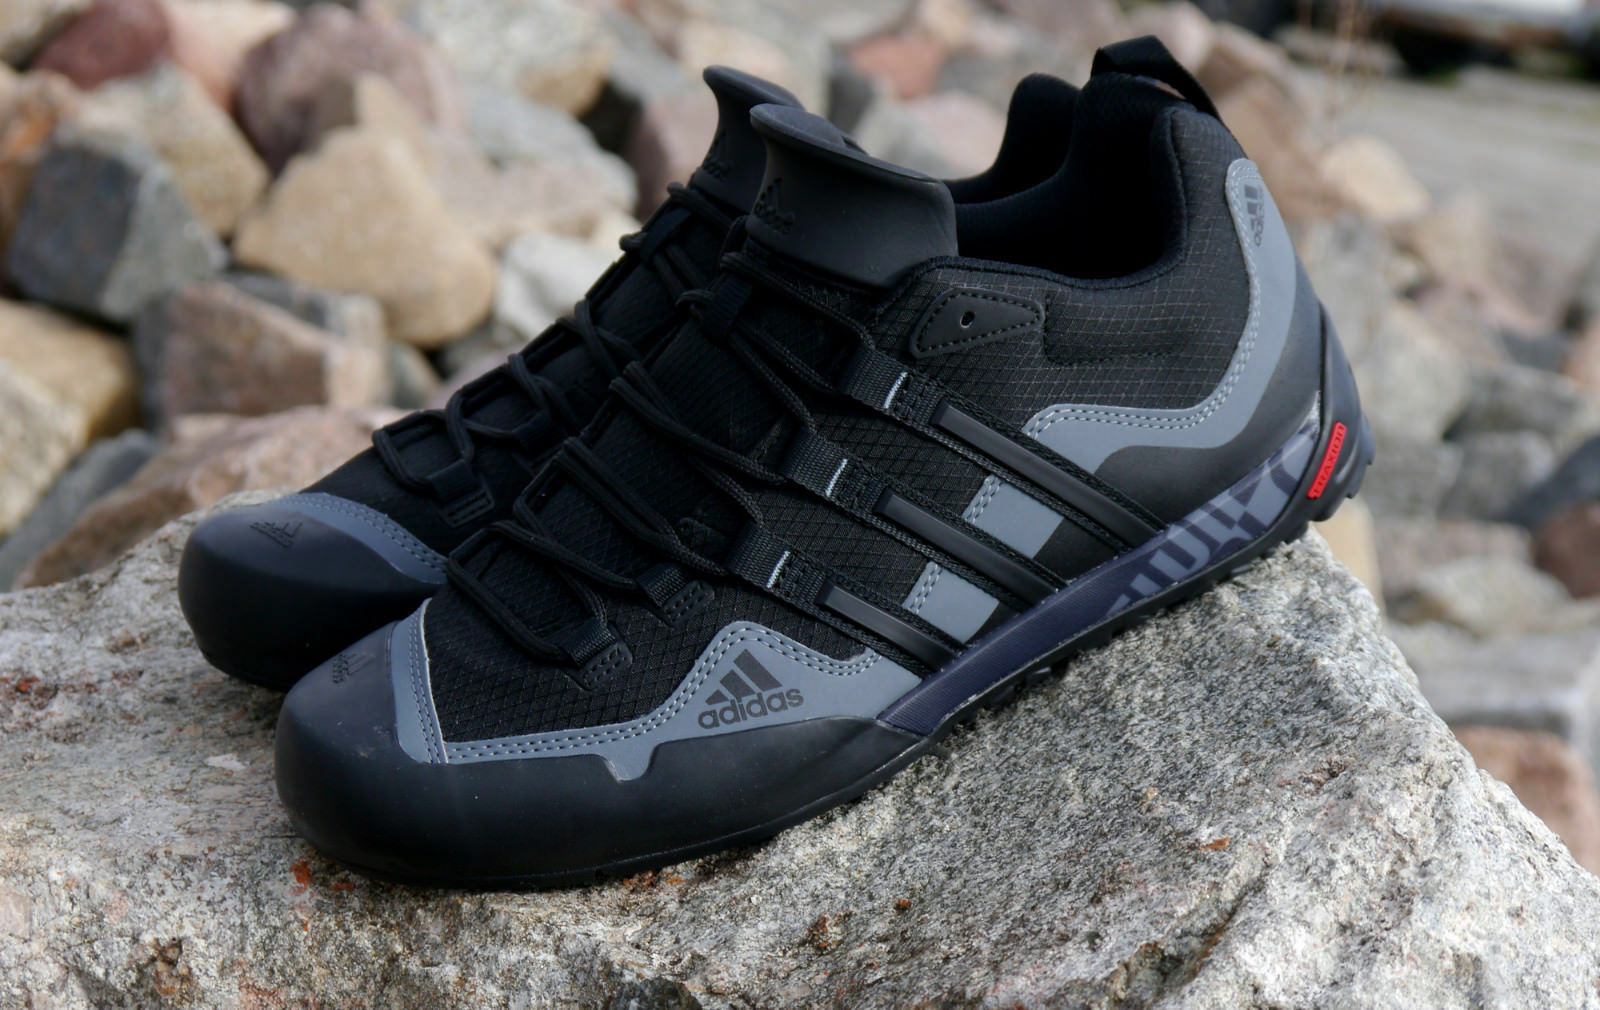 Adidas Terrex Swift Solo D67031 Men's Walking trekking shoes